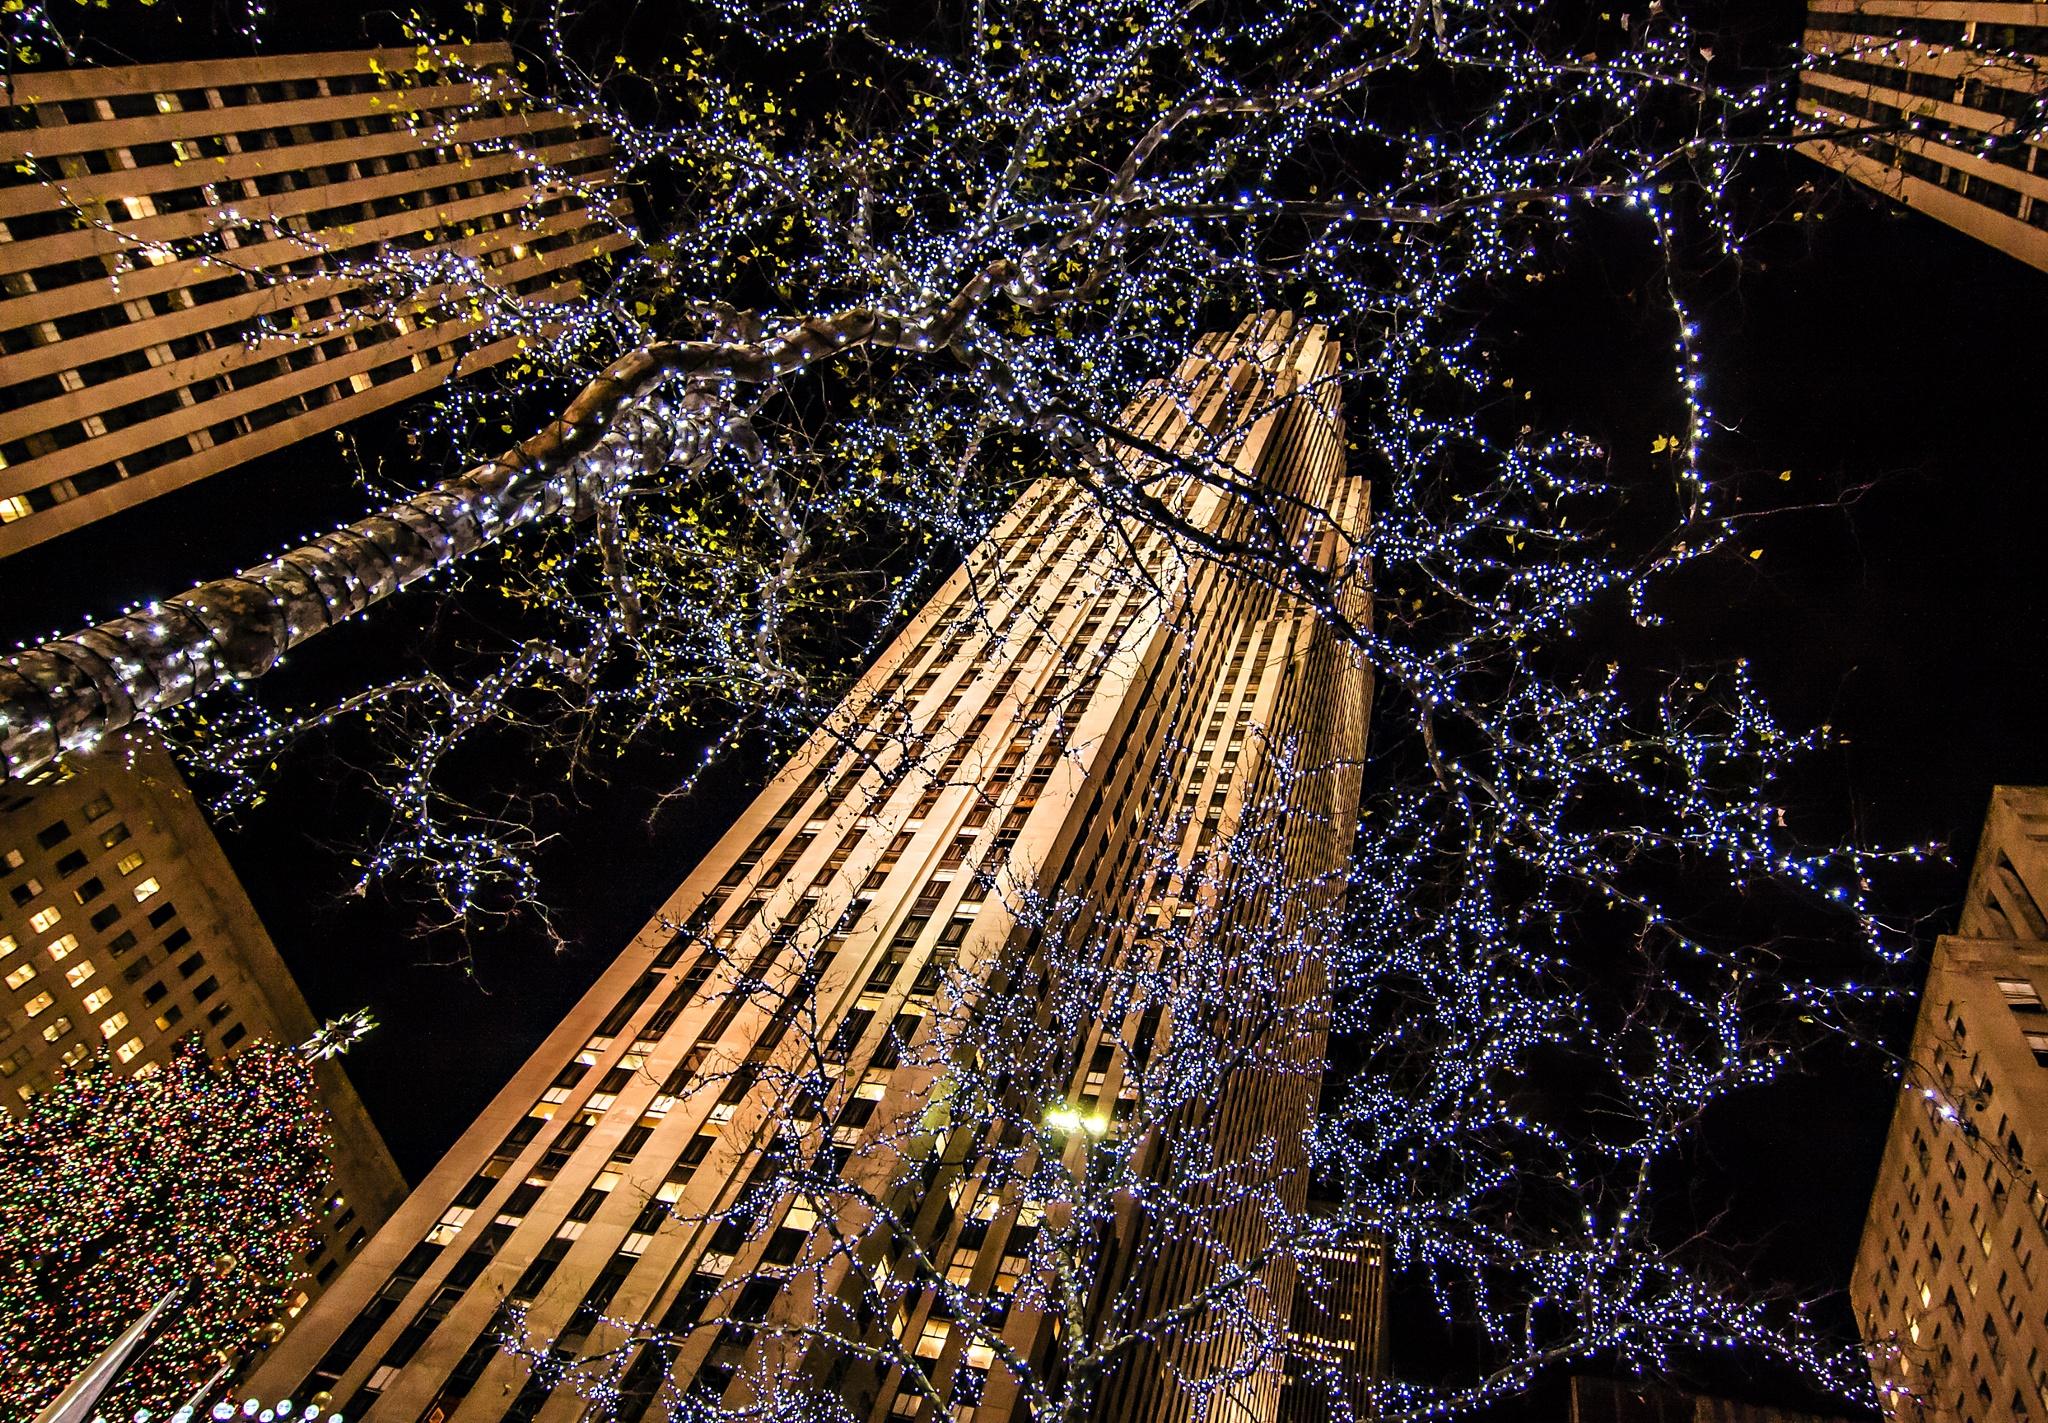 Little Lights by Tim Snyder